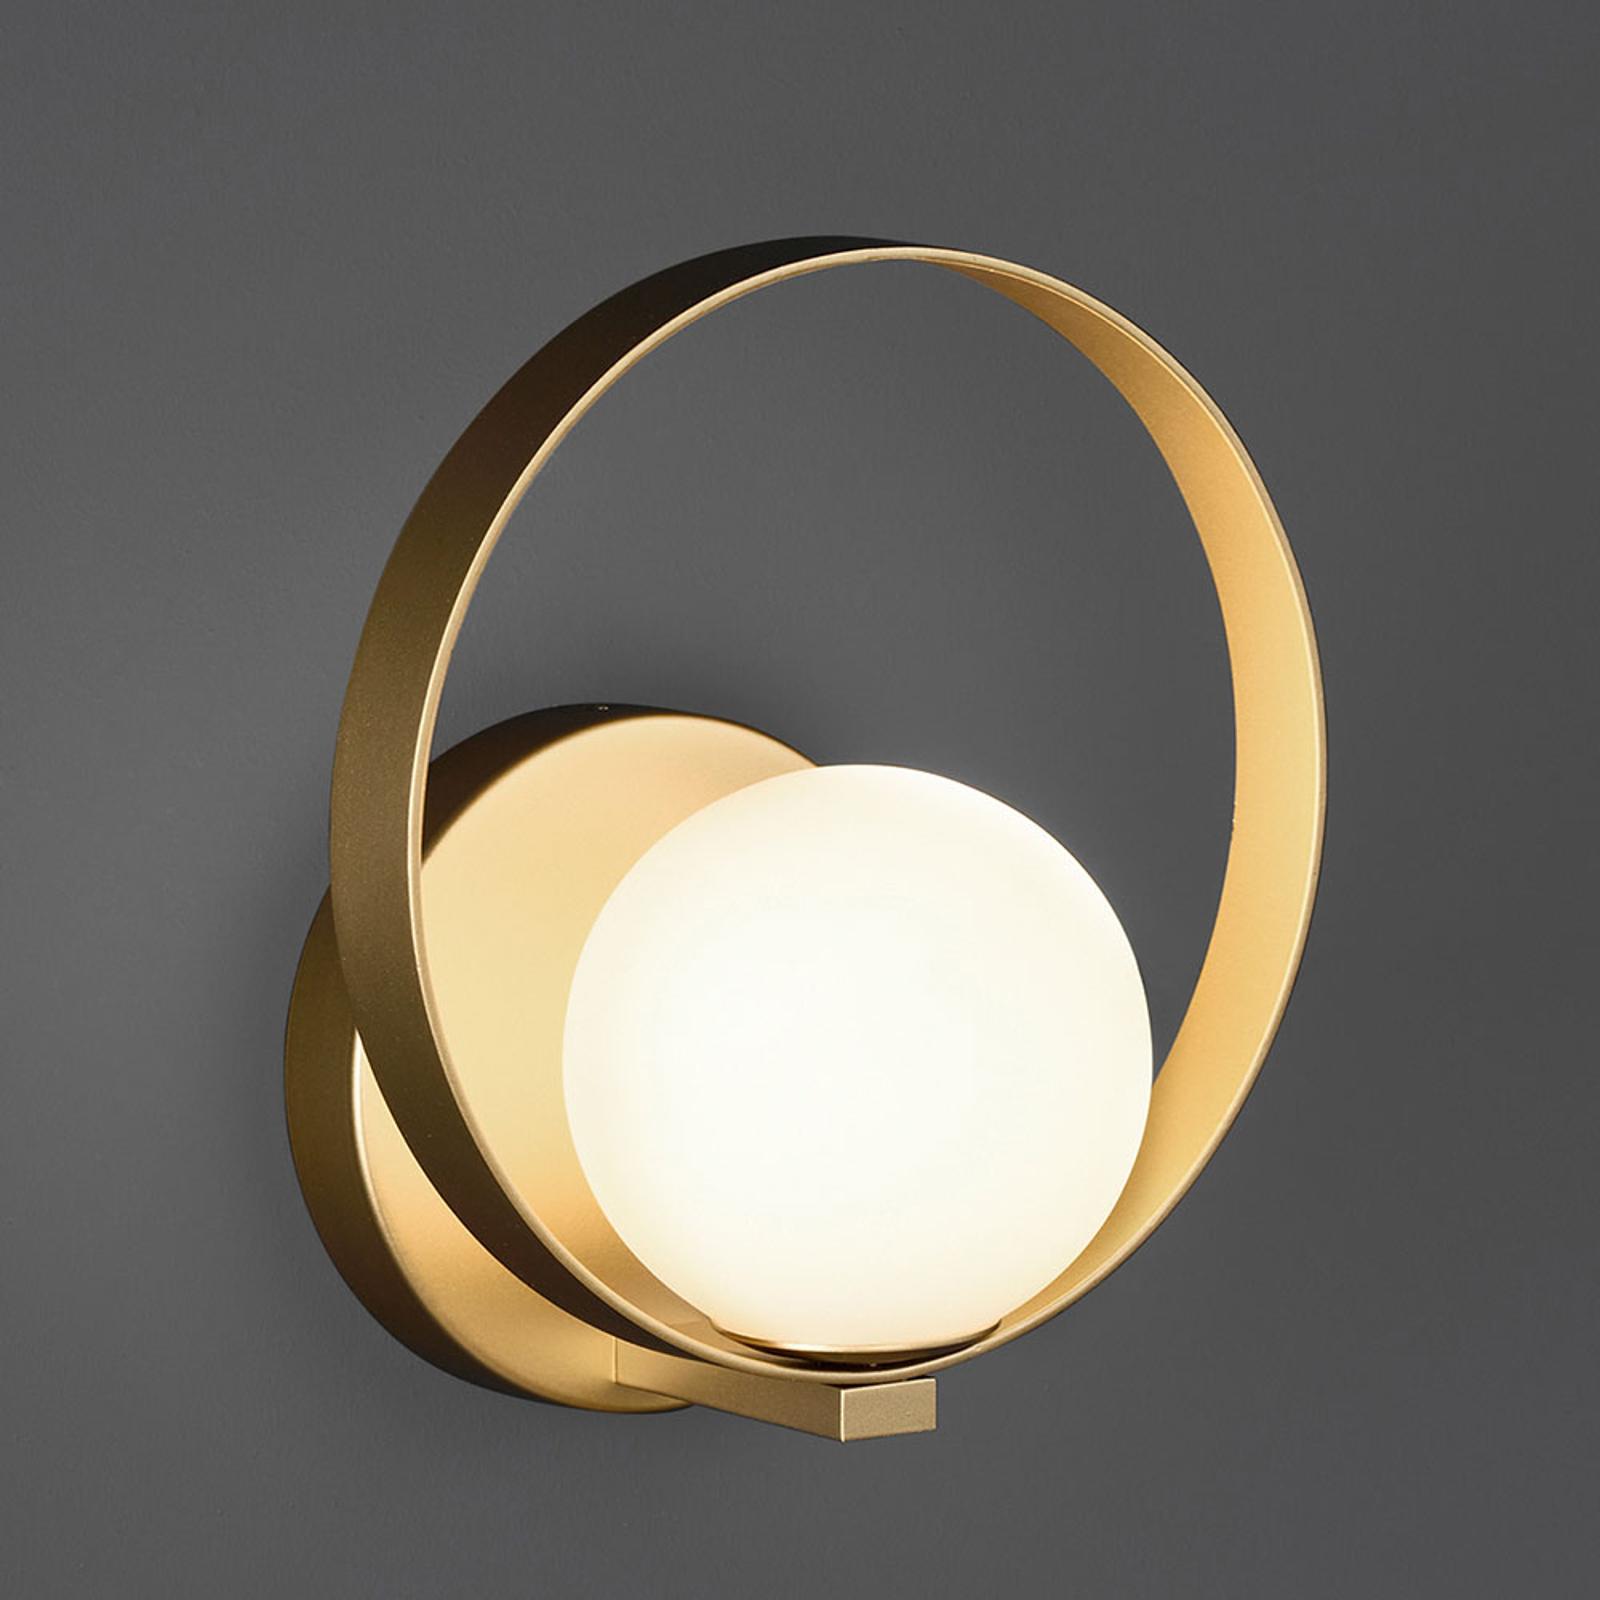 LED-Wandleuchte Halo, gold / opal